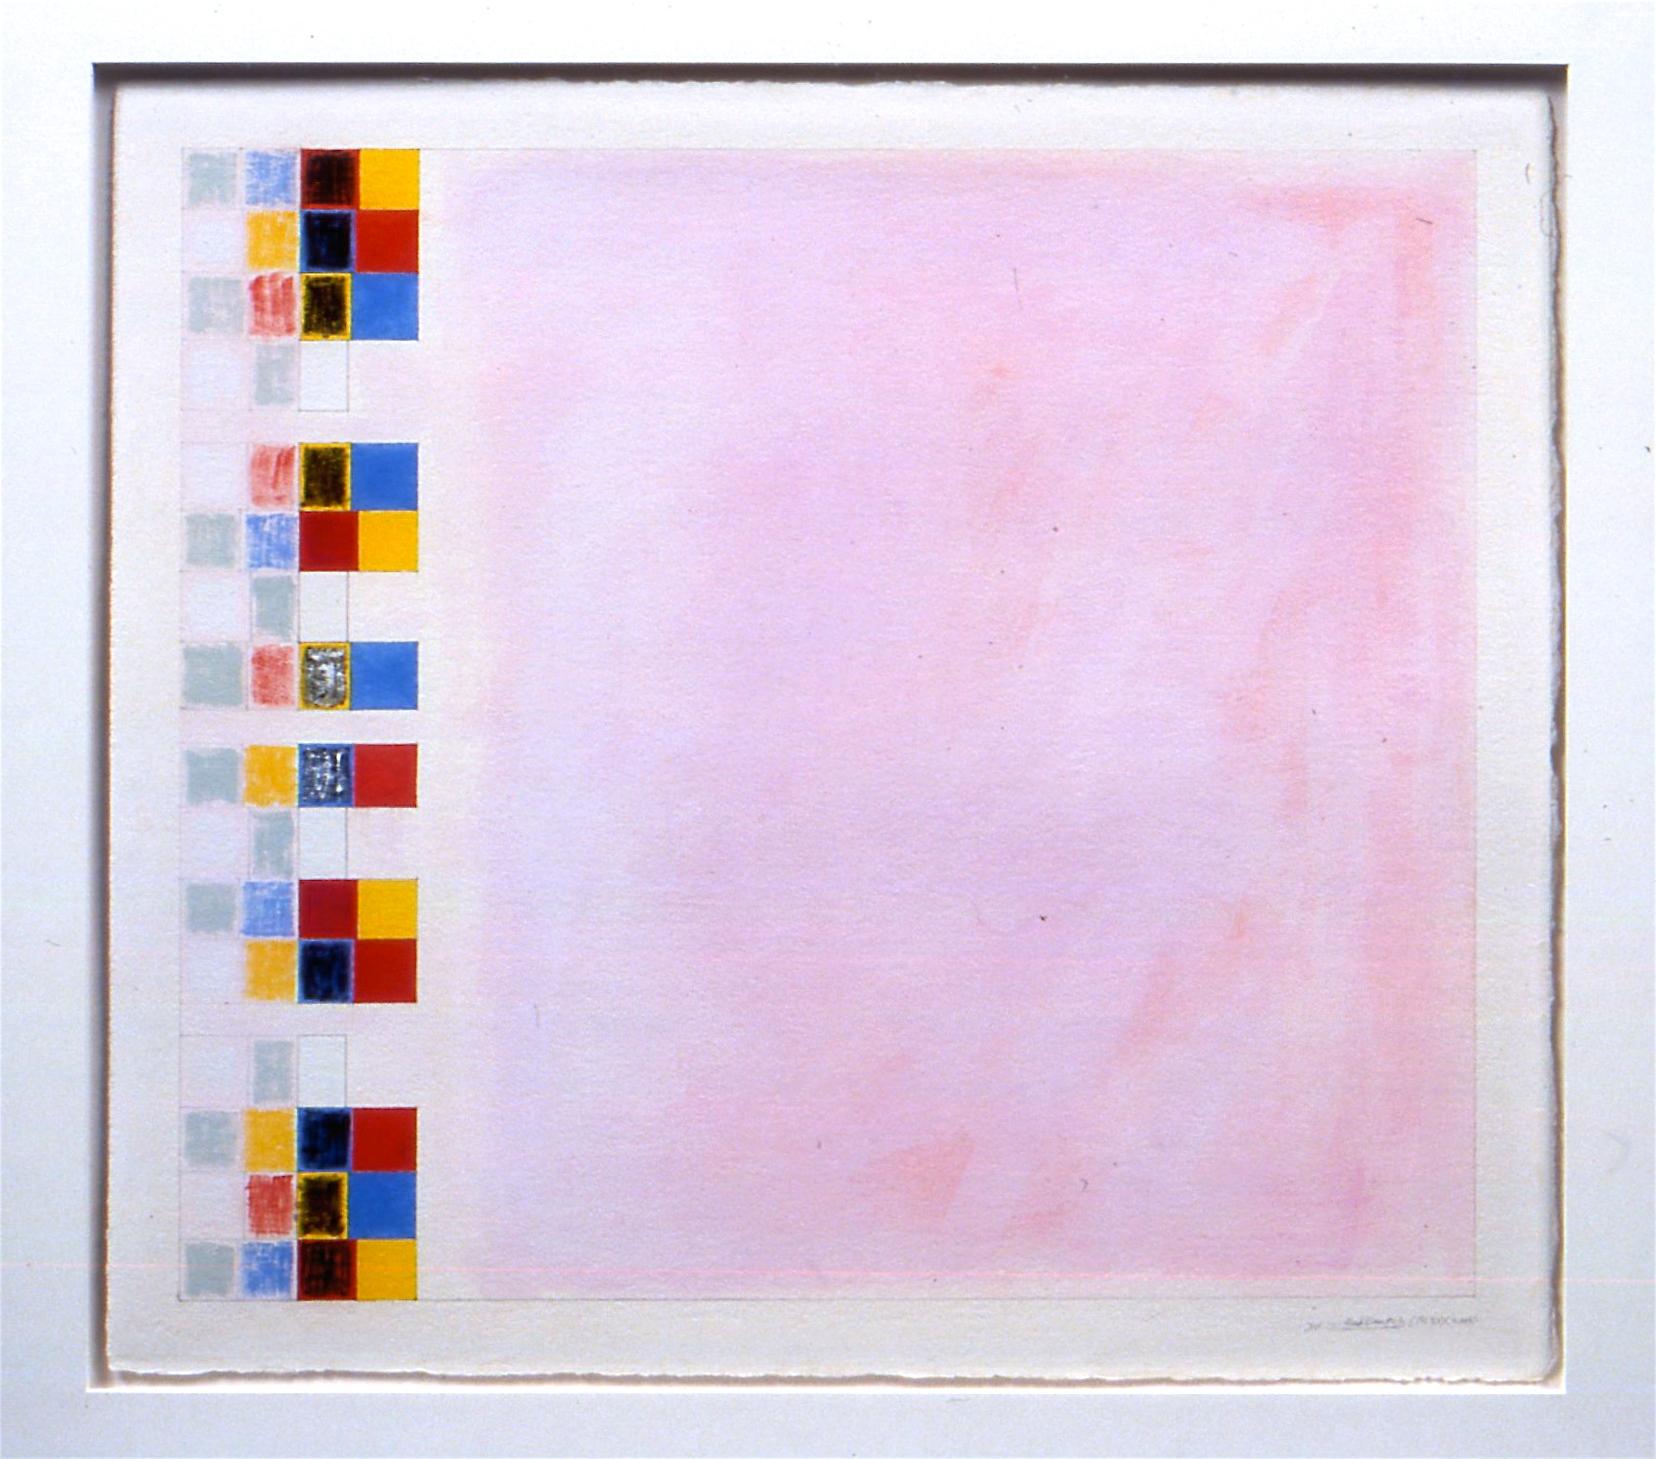 "Untitled... Red Desert, etc. IX (PG33). 2003, gouache on paper, 20 3/16""x23 3/16""(image), 22 5/8""x26"" (paper)"